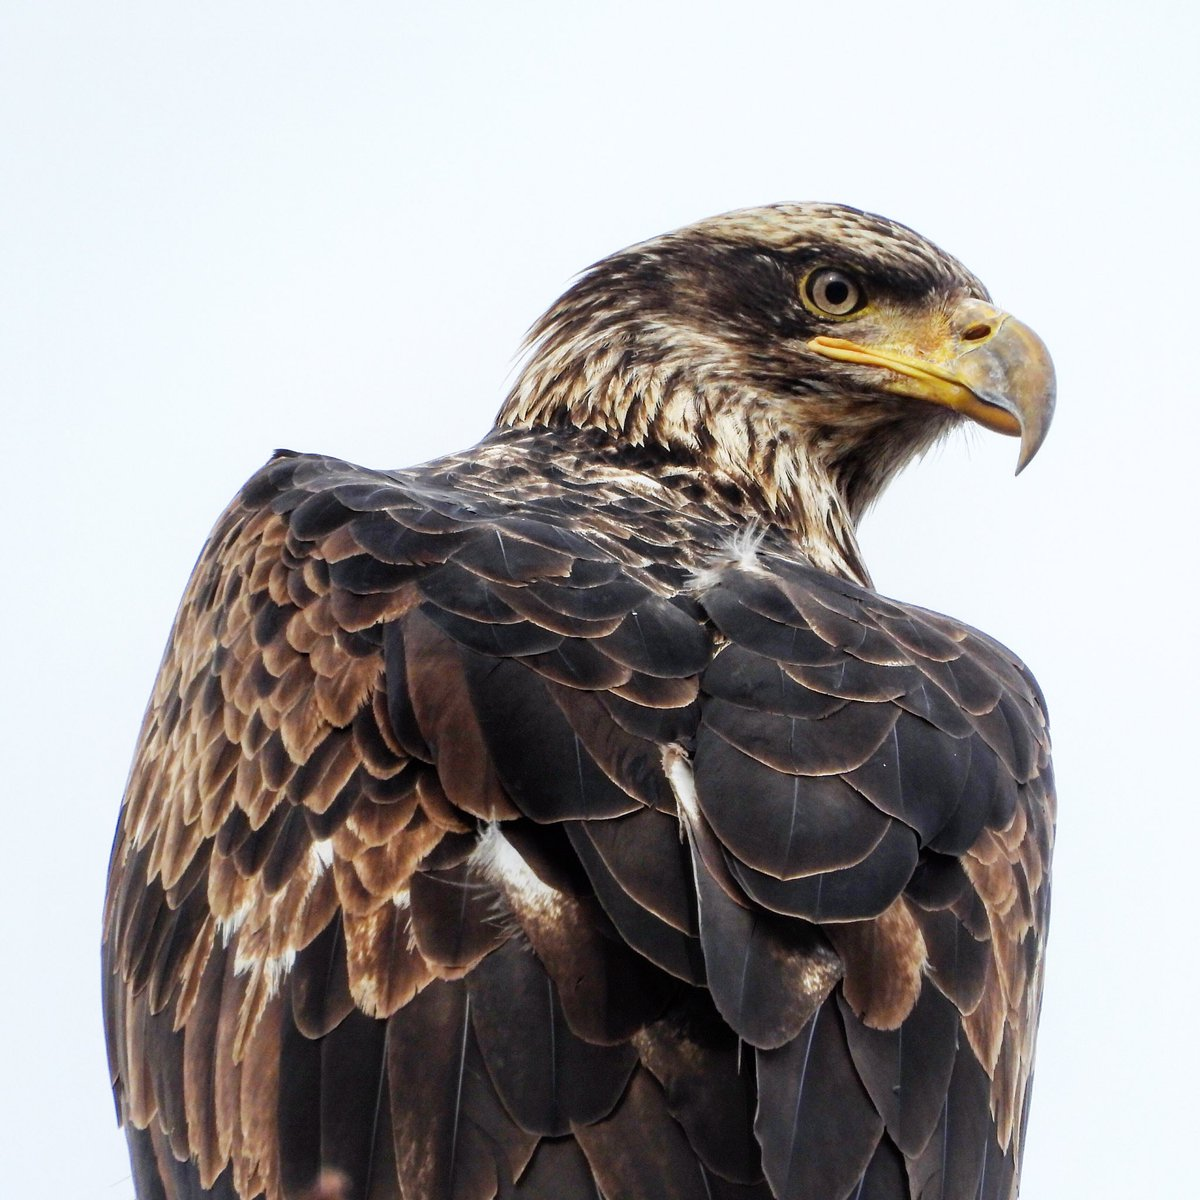 Beautiful young Bald eagle in delta this Sunday 16 February 2020 #dailybaldeagle #baldeagle #wildlife #nature #gbbc #birds #raptors #vancouverbirds #explorebc #vancity #exploredelta #experiencedelta #wildvancouver #canadianwildlife #pnw #natgeo #cangeo #canada https://t.co/IRKuqQeGpo